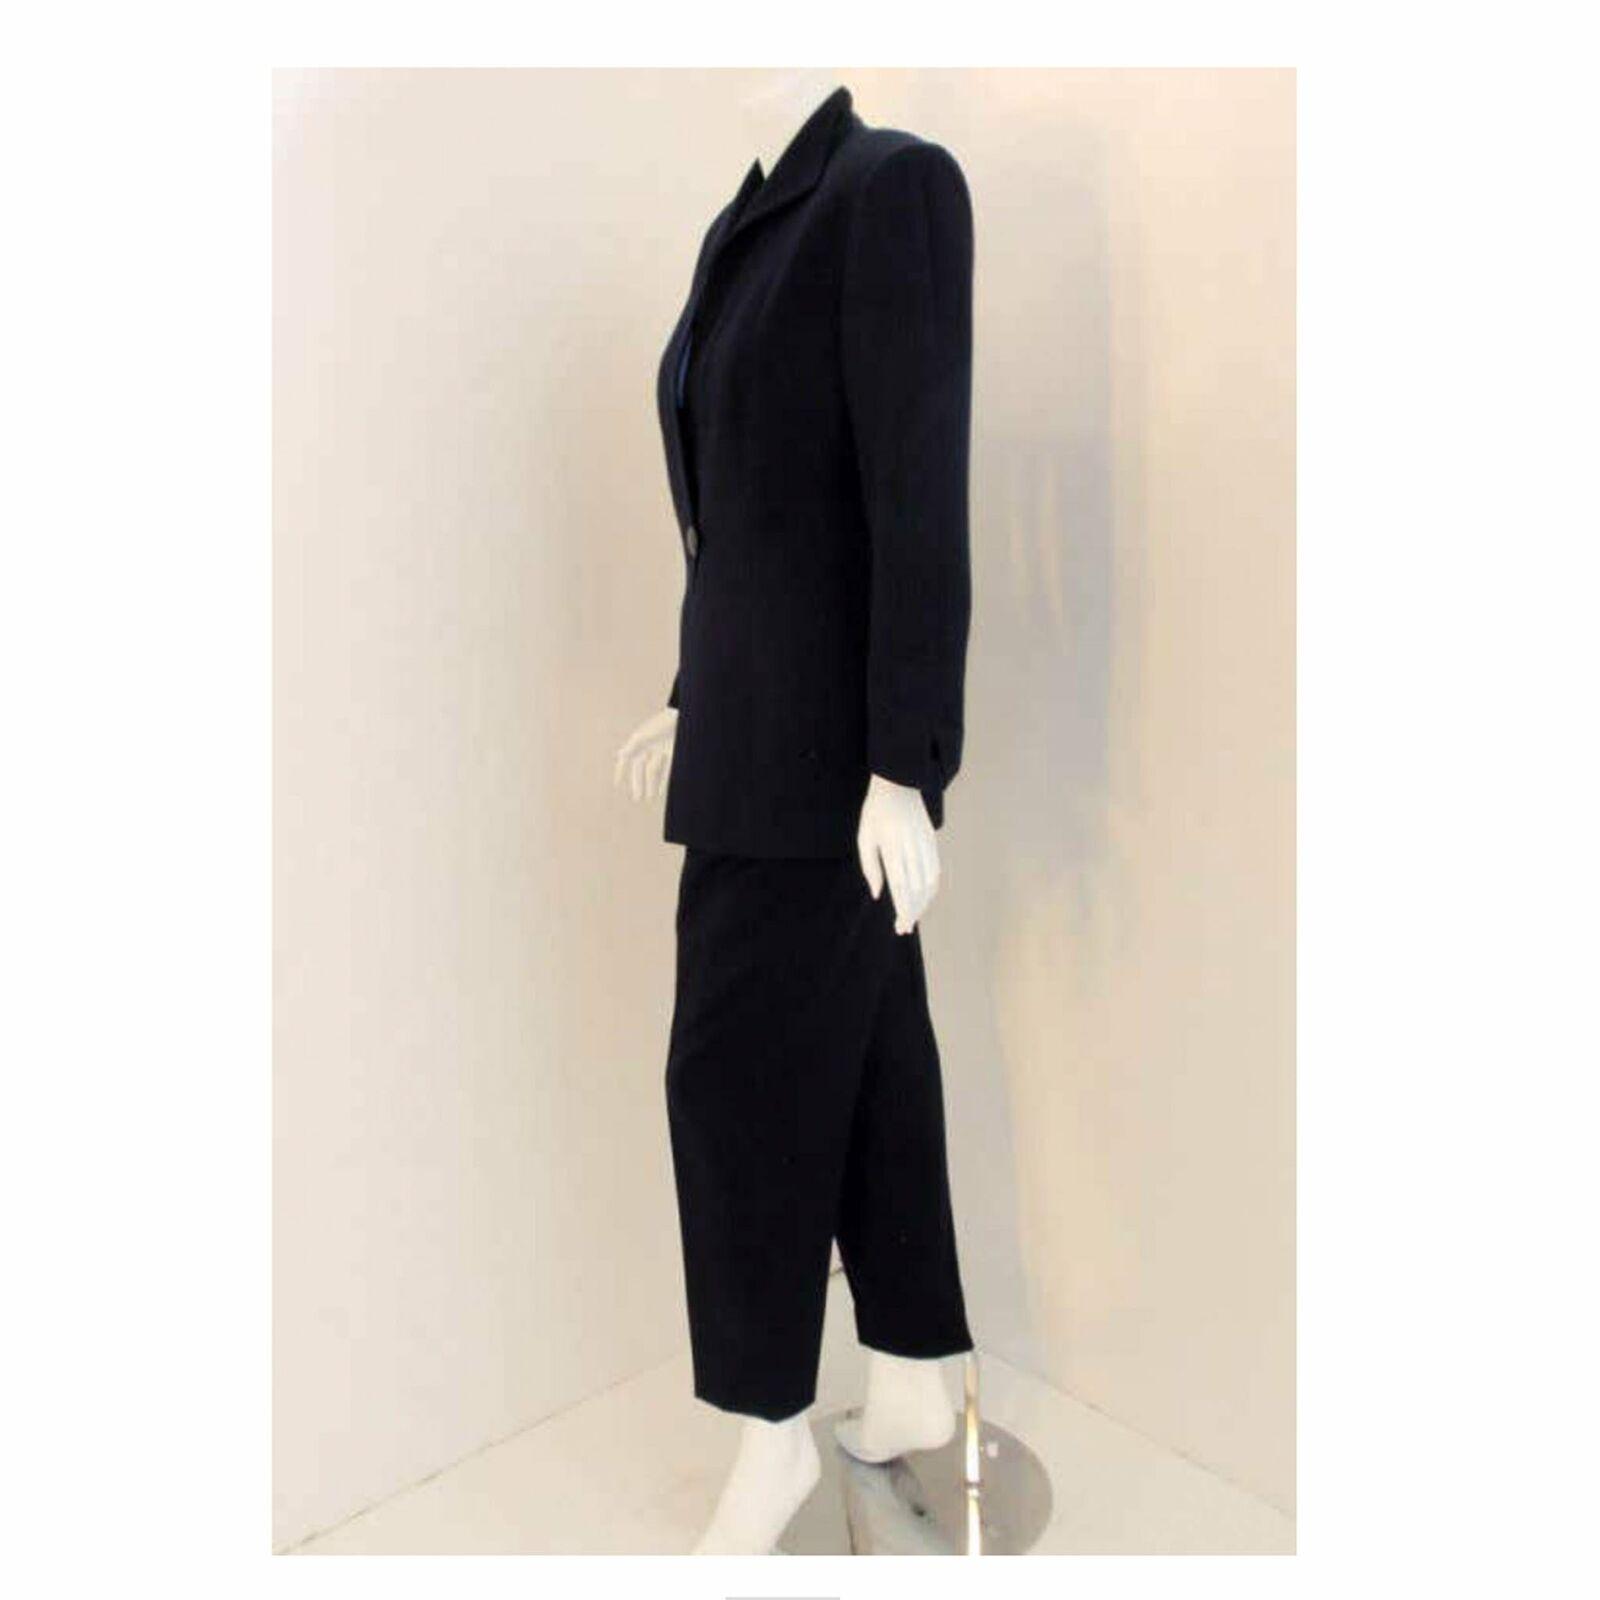 CHRISTIAN DIOR 1980s 2 pc Dark Blue Pant Suit - image 6